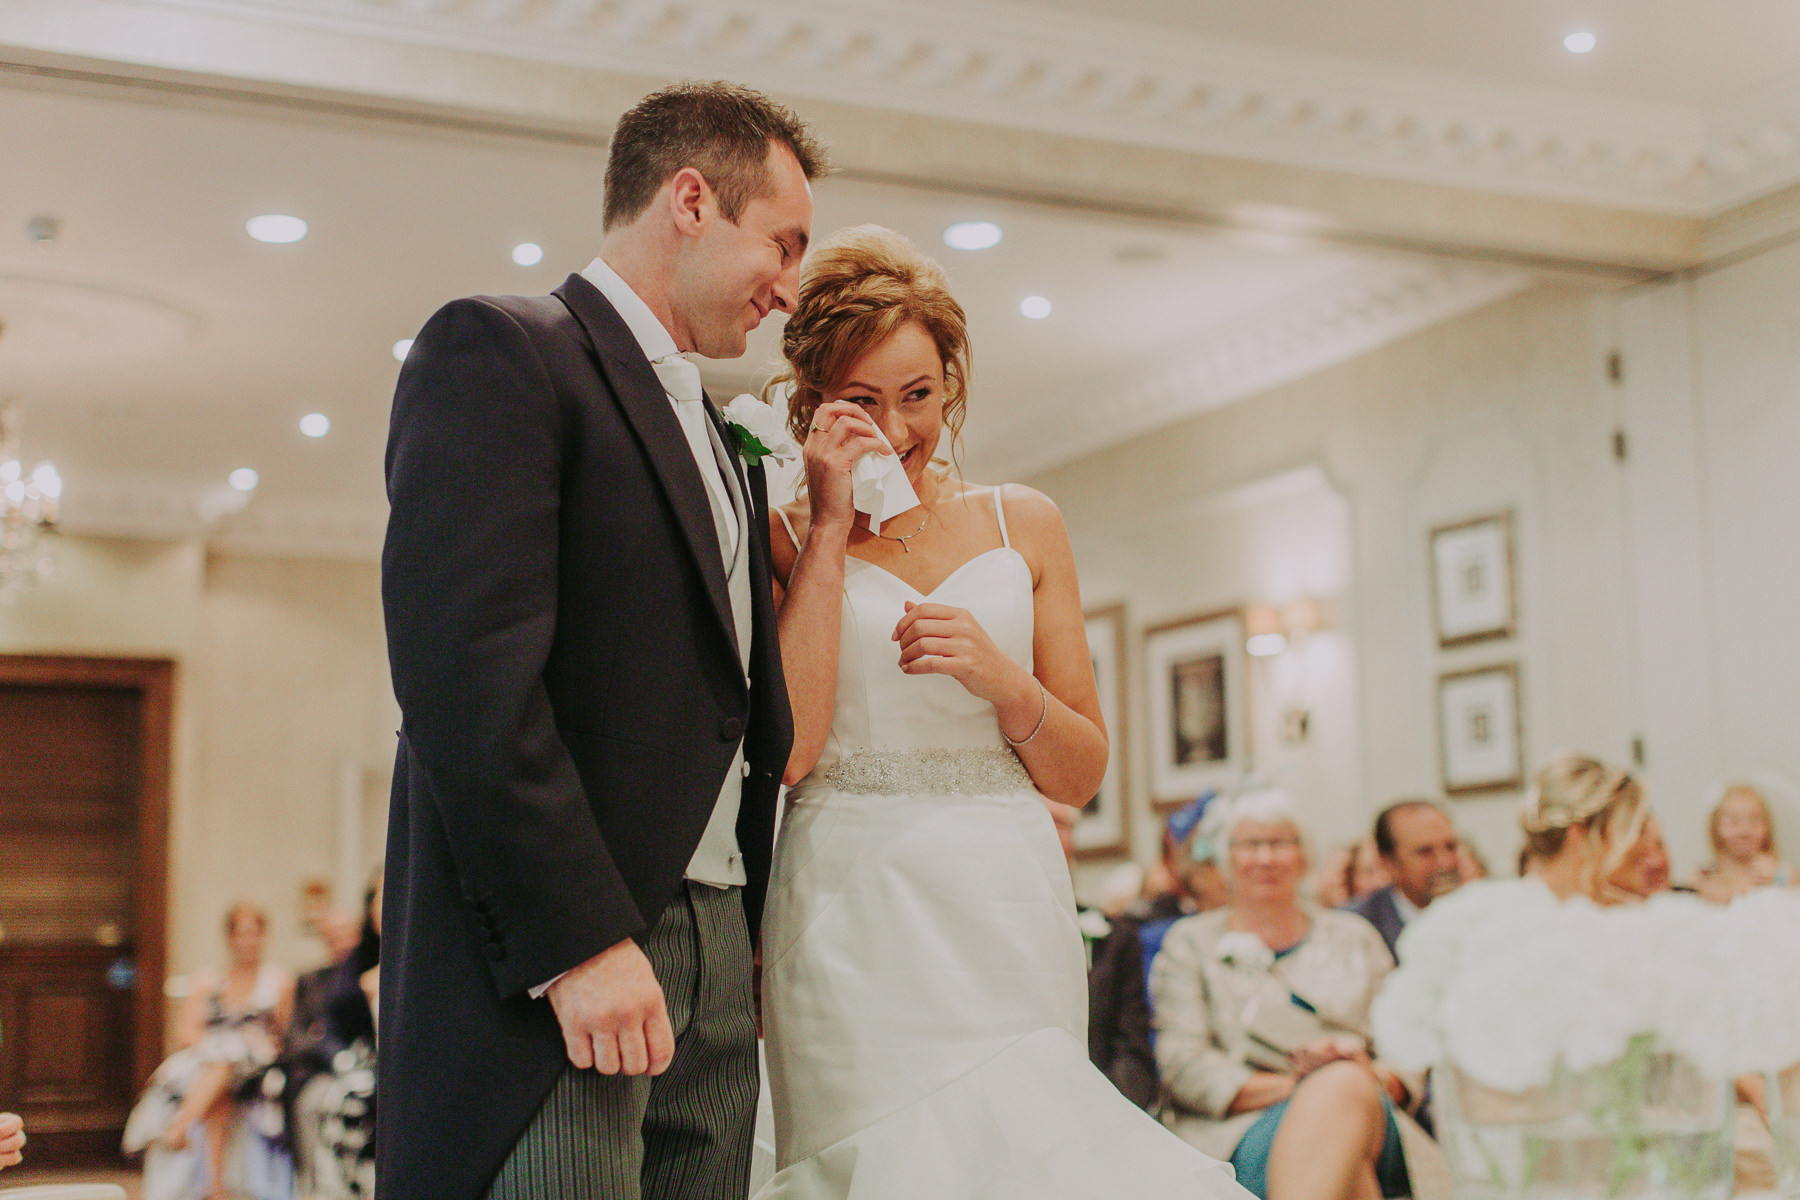 Meg & Jon | Wood Hall Hotel Wedding 323